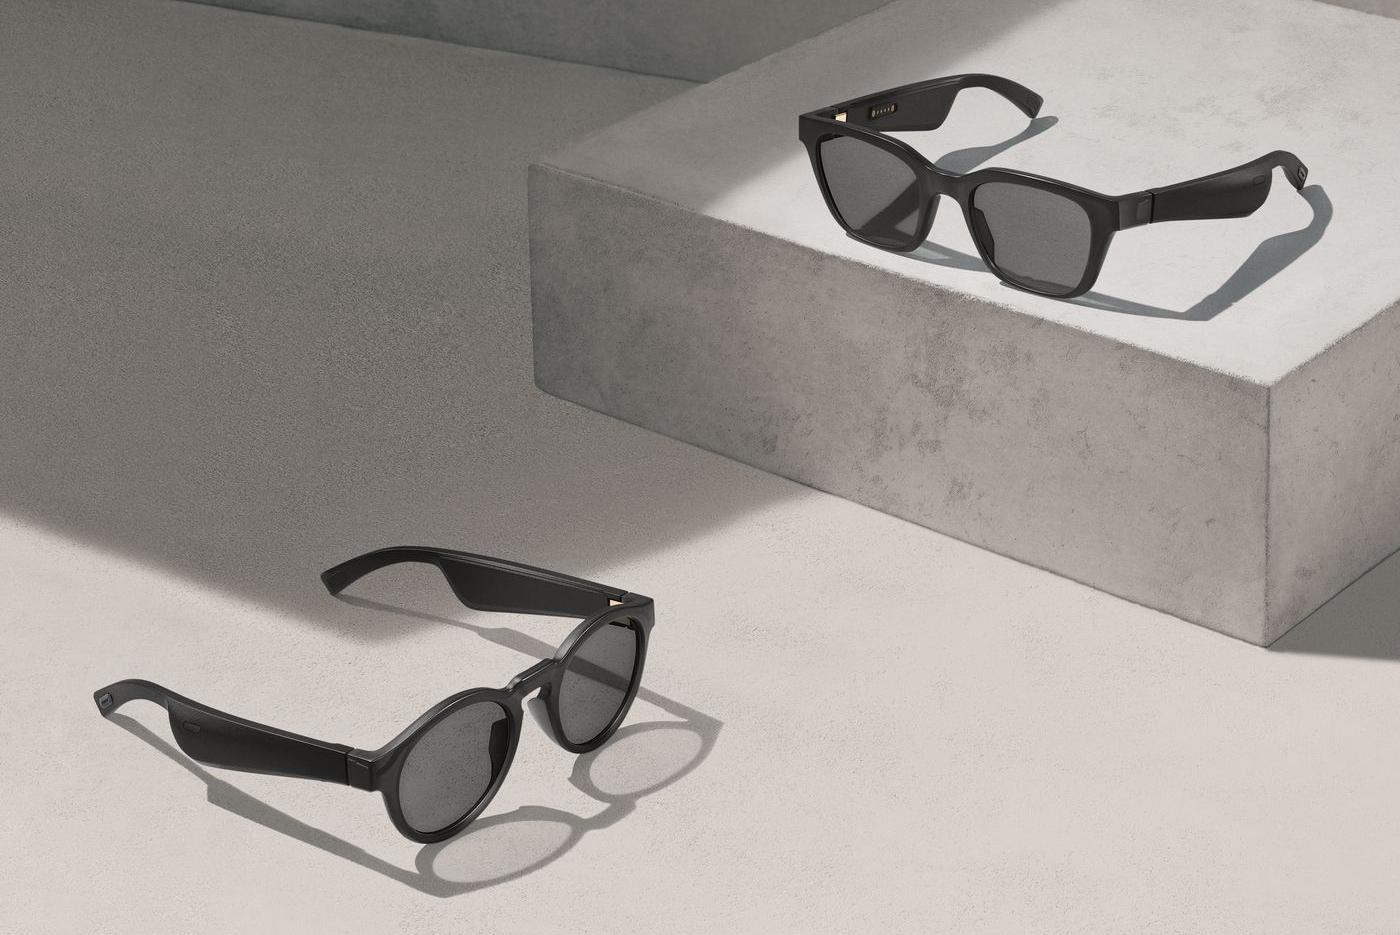 BOSE推出了一副会说话的AR眼镜